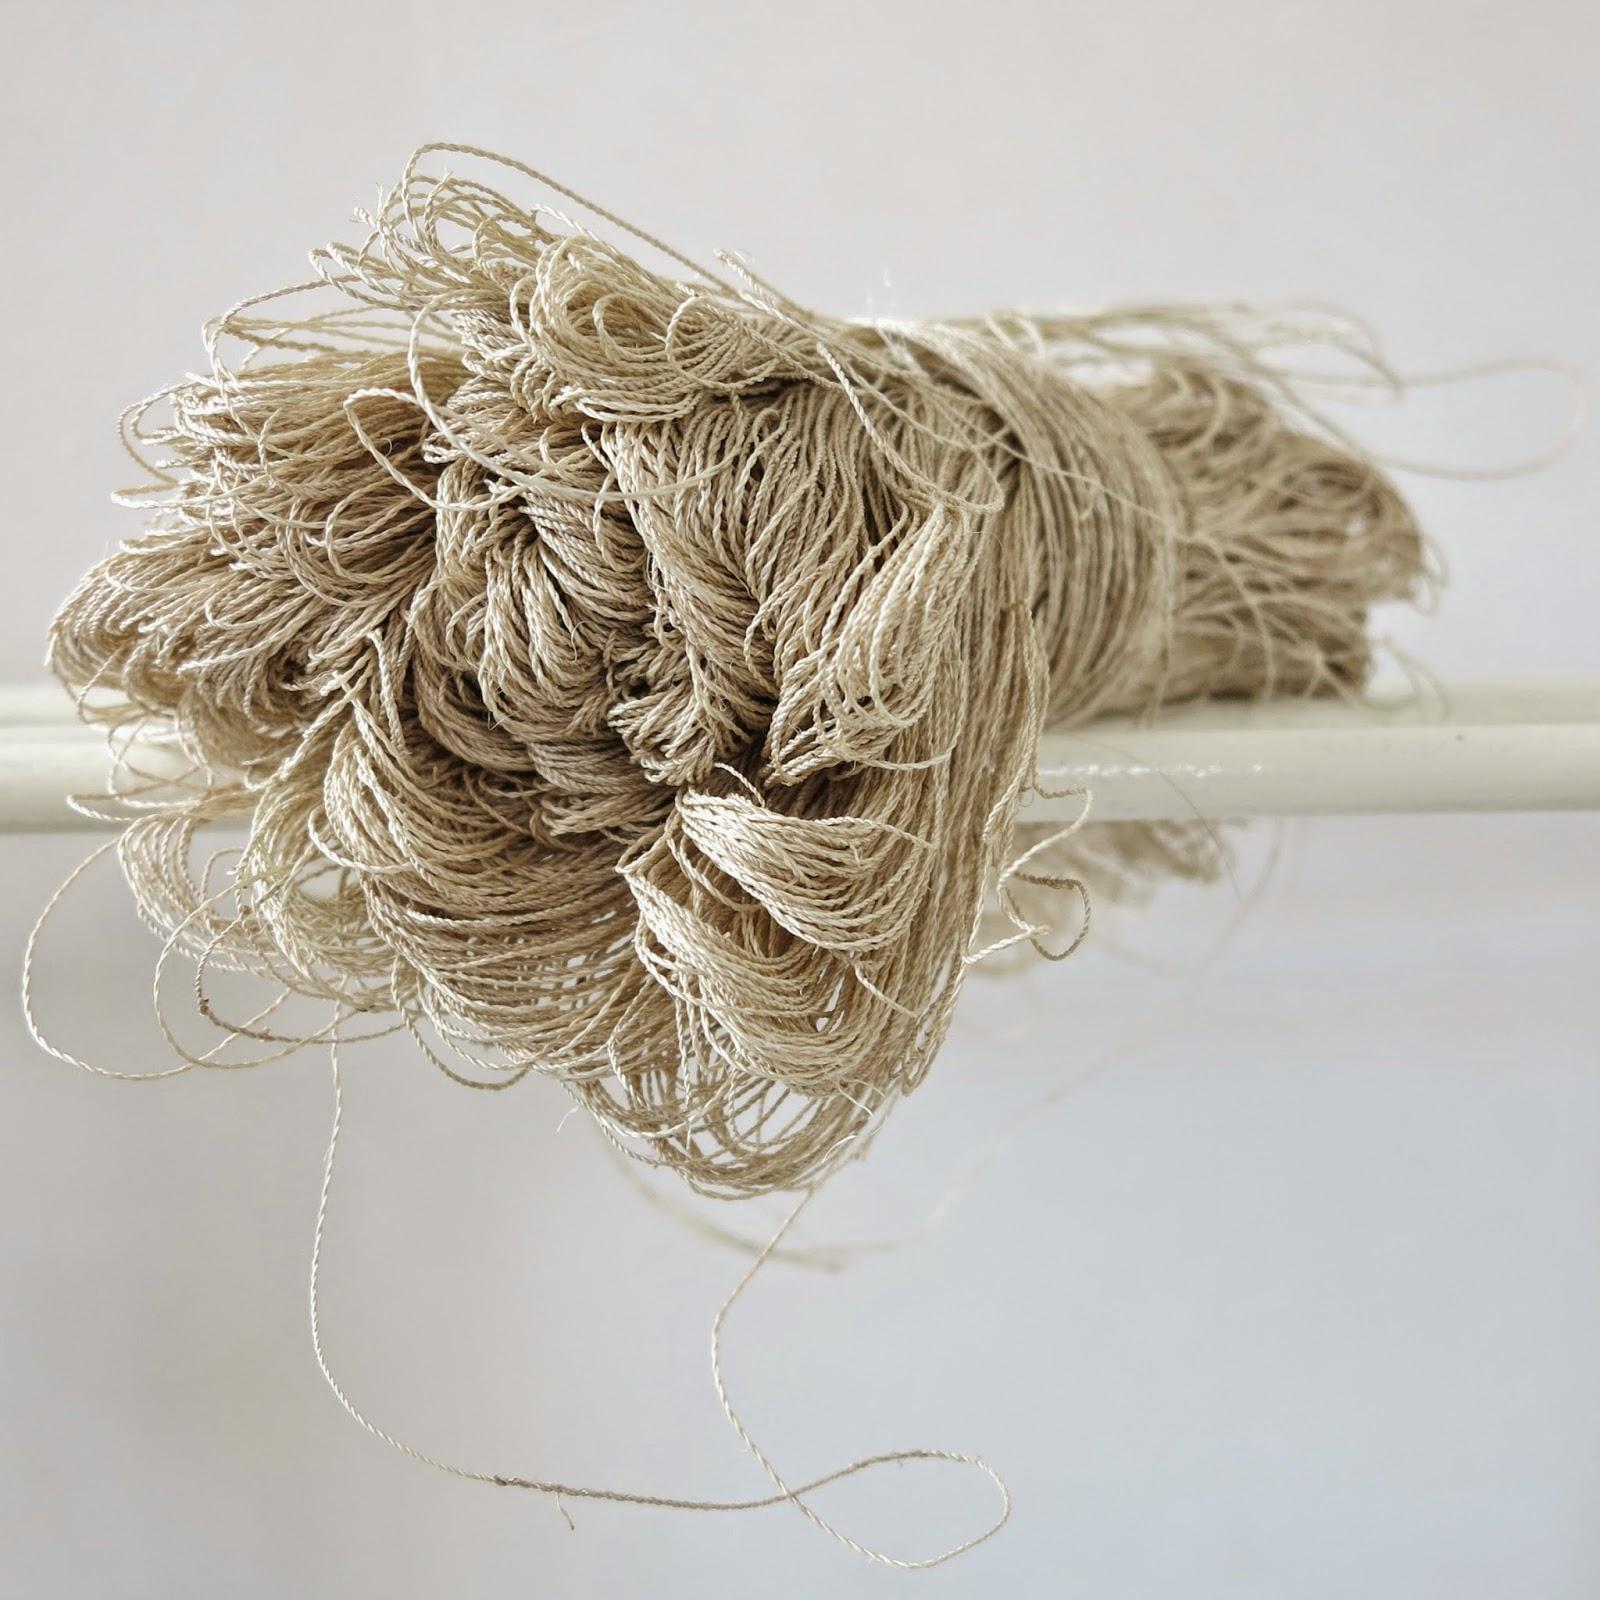 byHaafner, crochet, JungleVine, yarn, skein